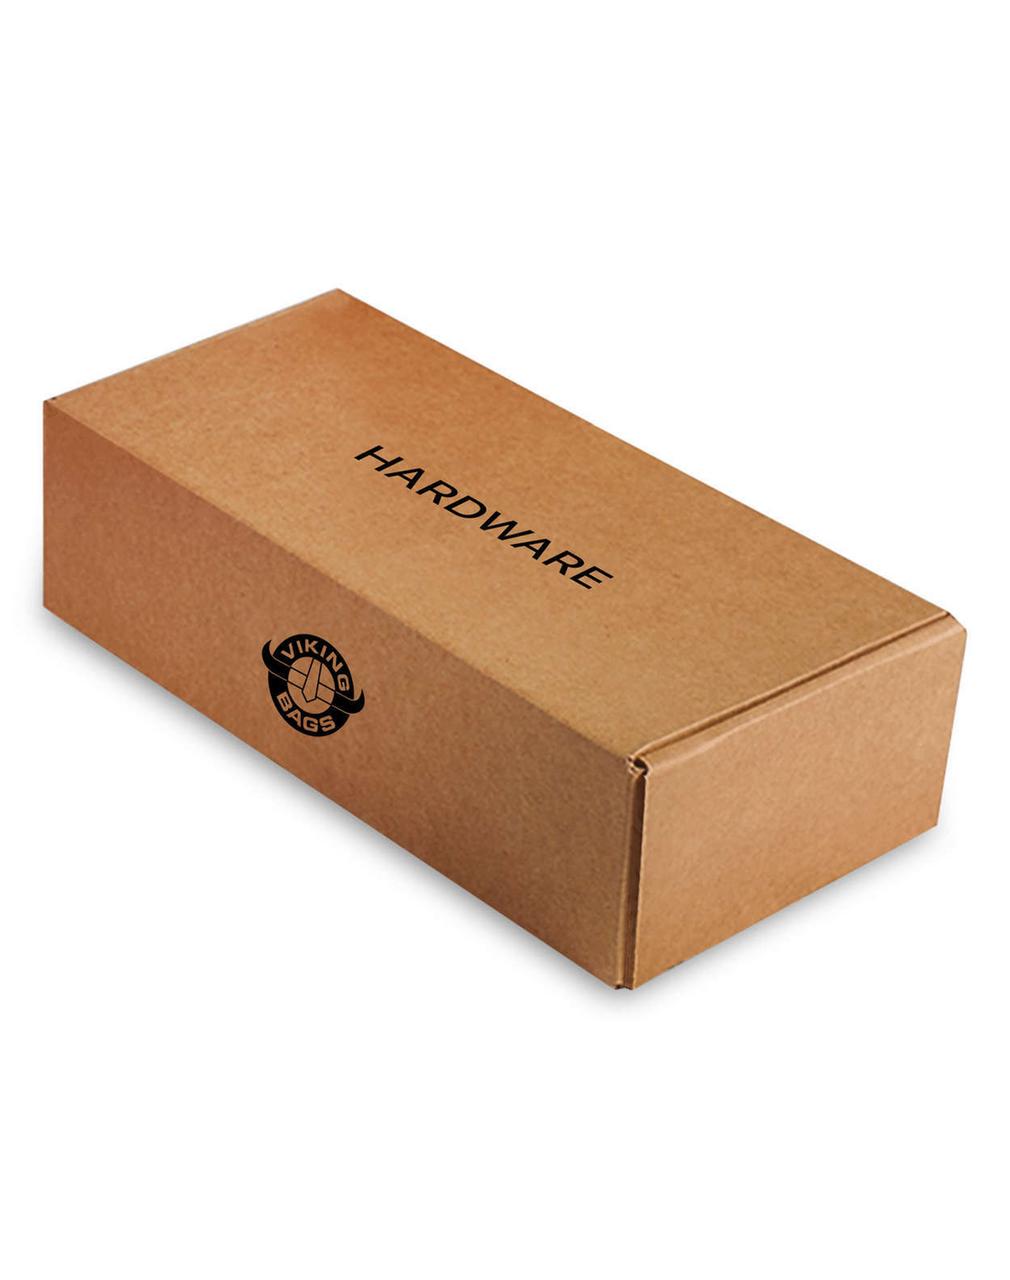 Honda 1500 Valkyrie Standard SS Side Pocket Motorcycle saddlebags Box